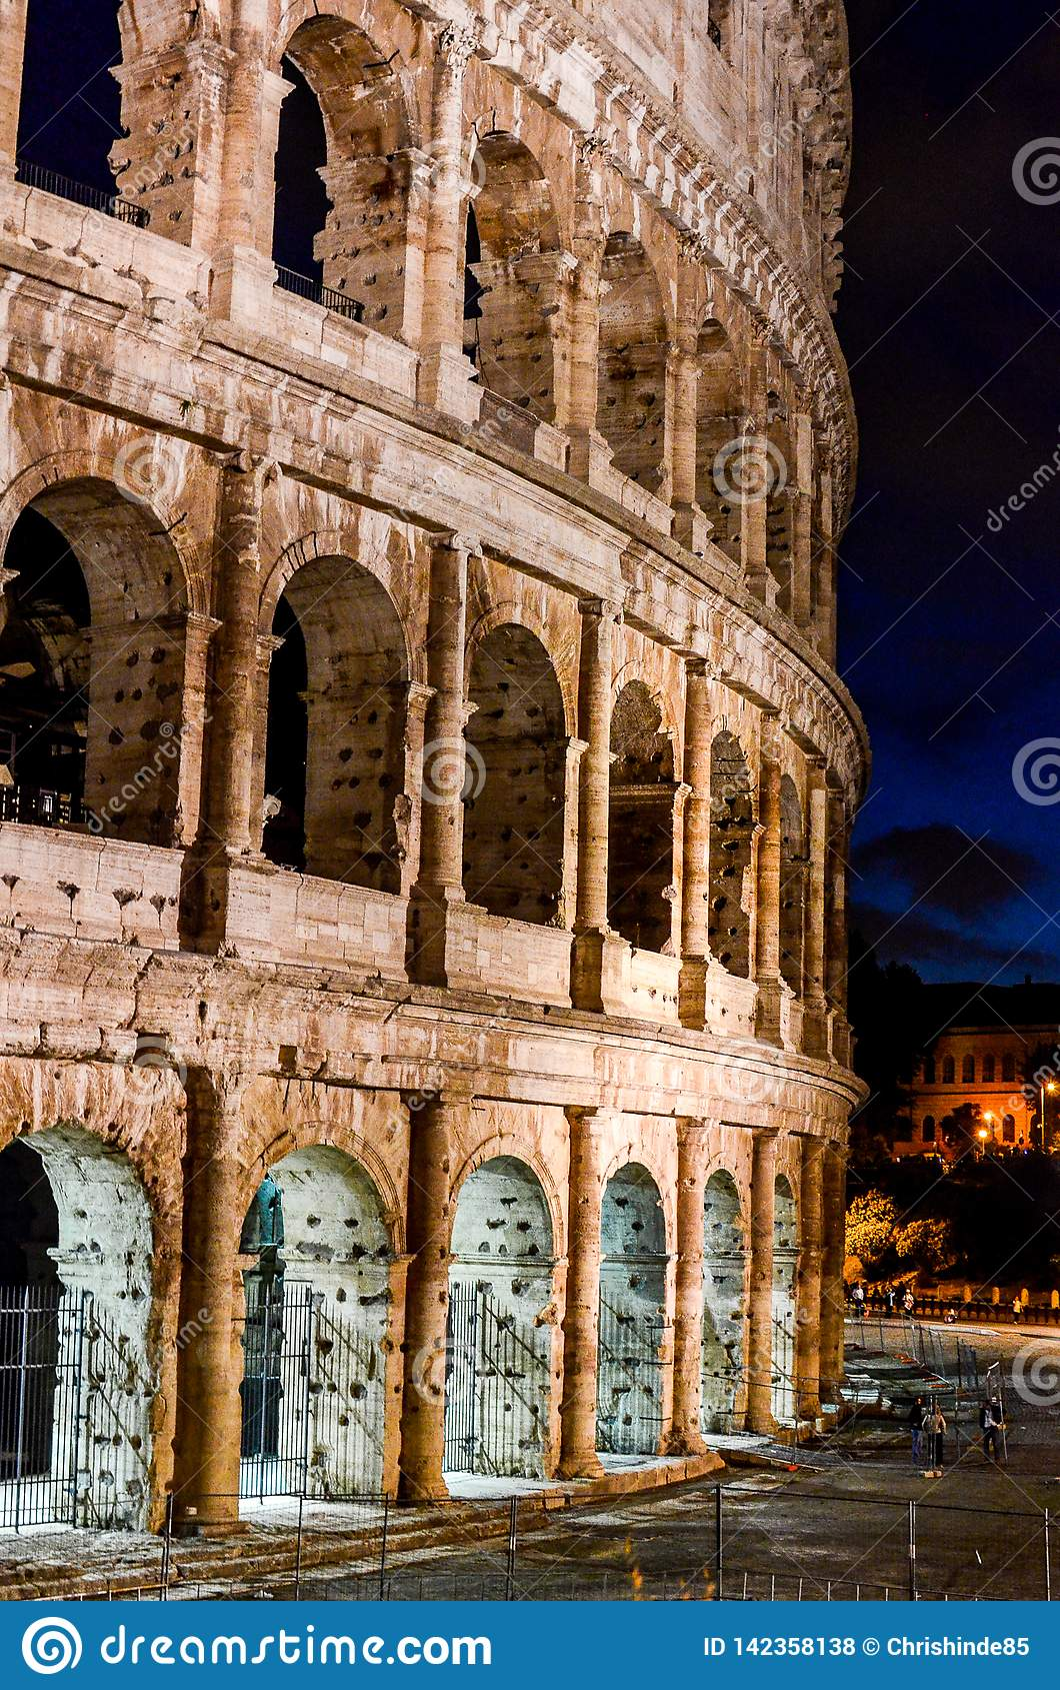 Nighttime Colosseum 4